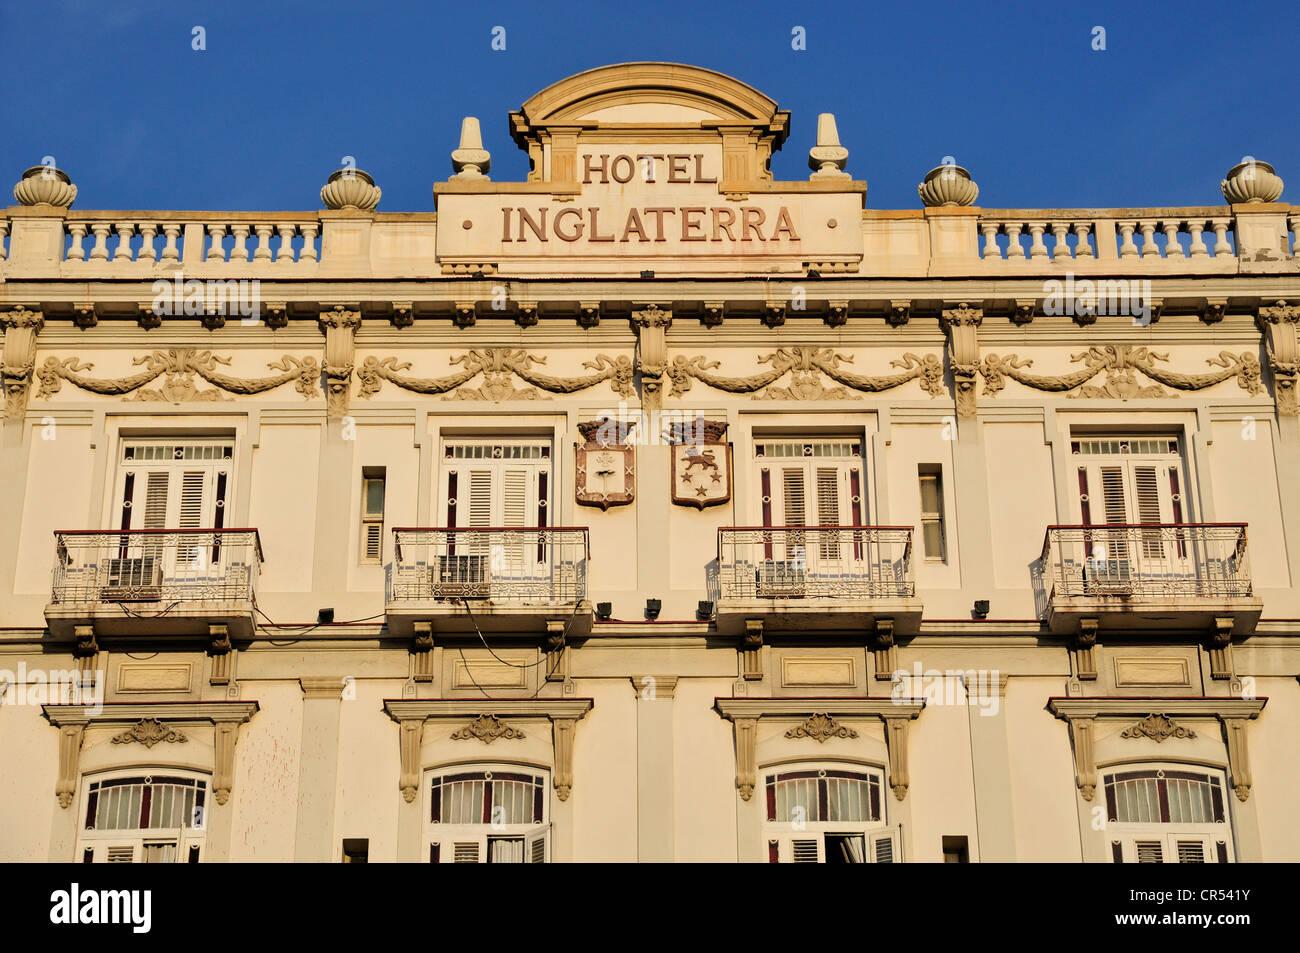 Facade of the Inglaterra Hotel, Habana Vieja, Old Havana, Havana, Cuba, Caribbean - Stock Image